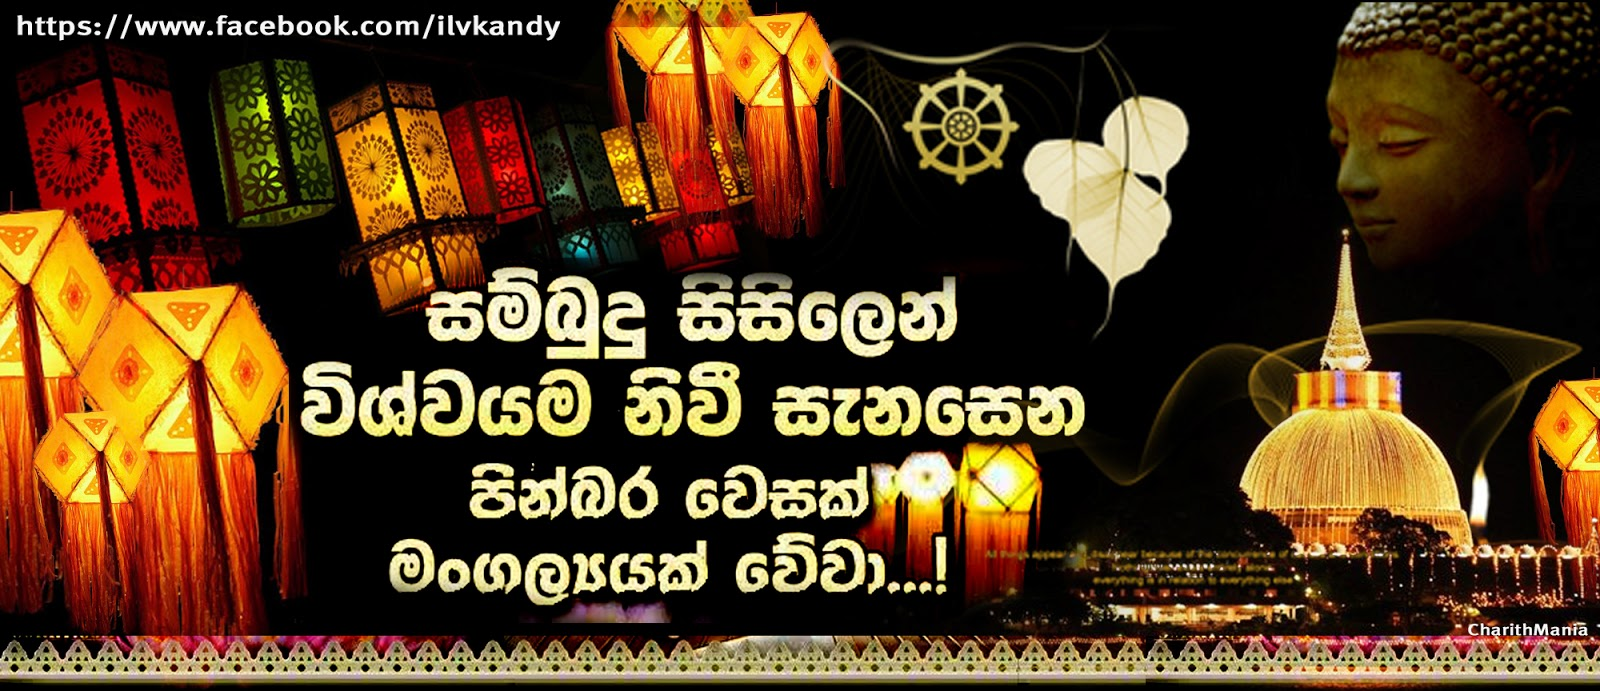 Vesakposon greetings vesak vesakposon greetings vesak poya images vesak day pictures vesak wallpapers kristyandbryce Images